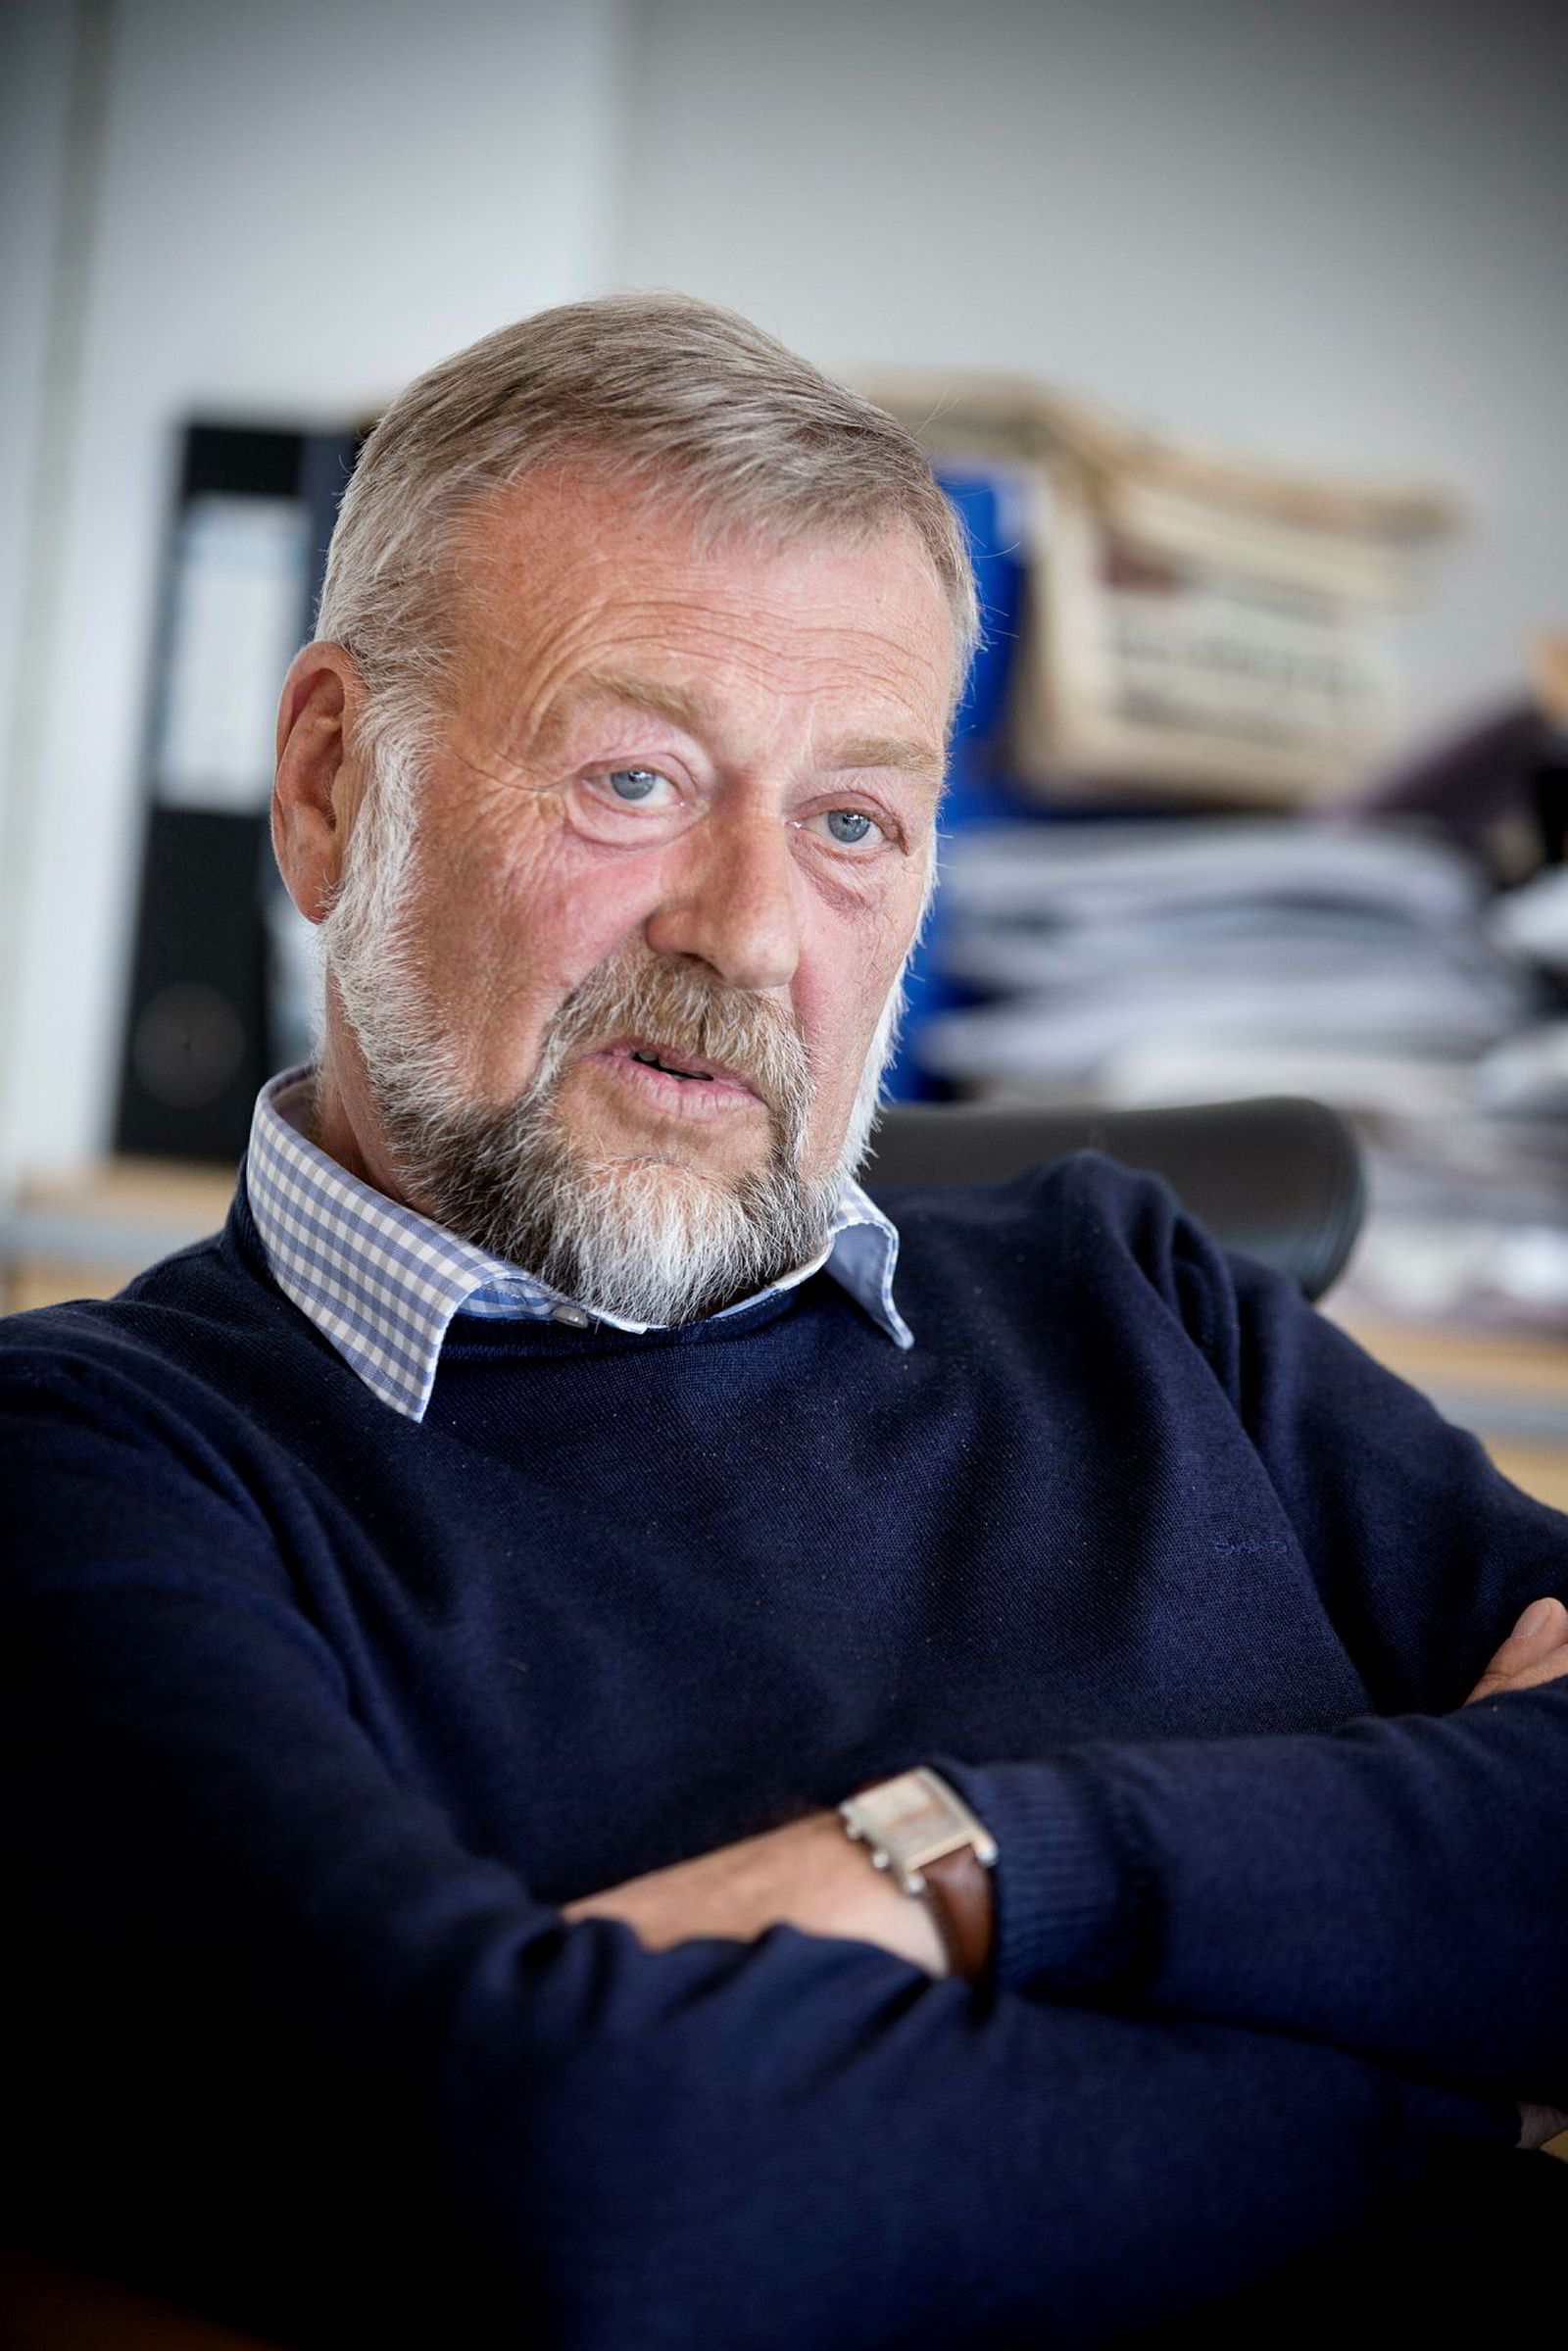 Olje- og riggründer Bjarne Skeie har satt prisrekord i Kristiansand.